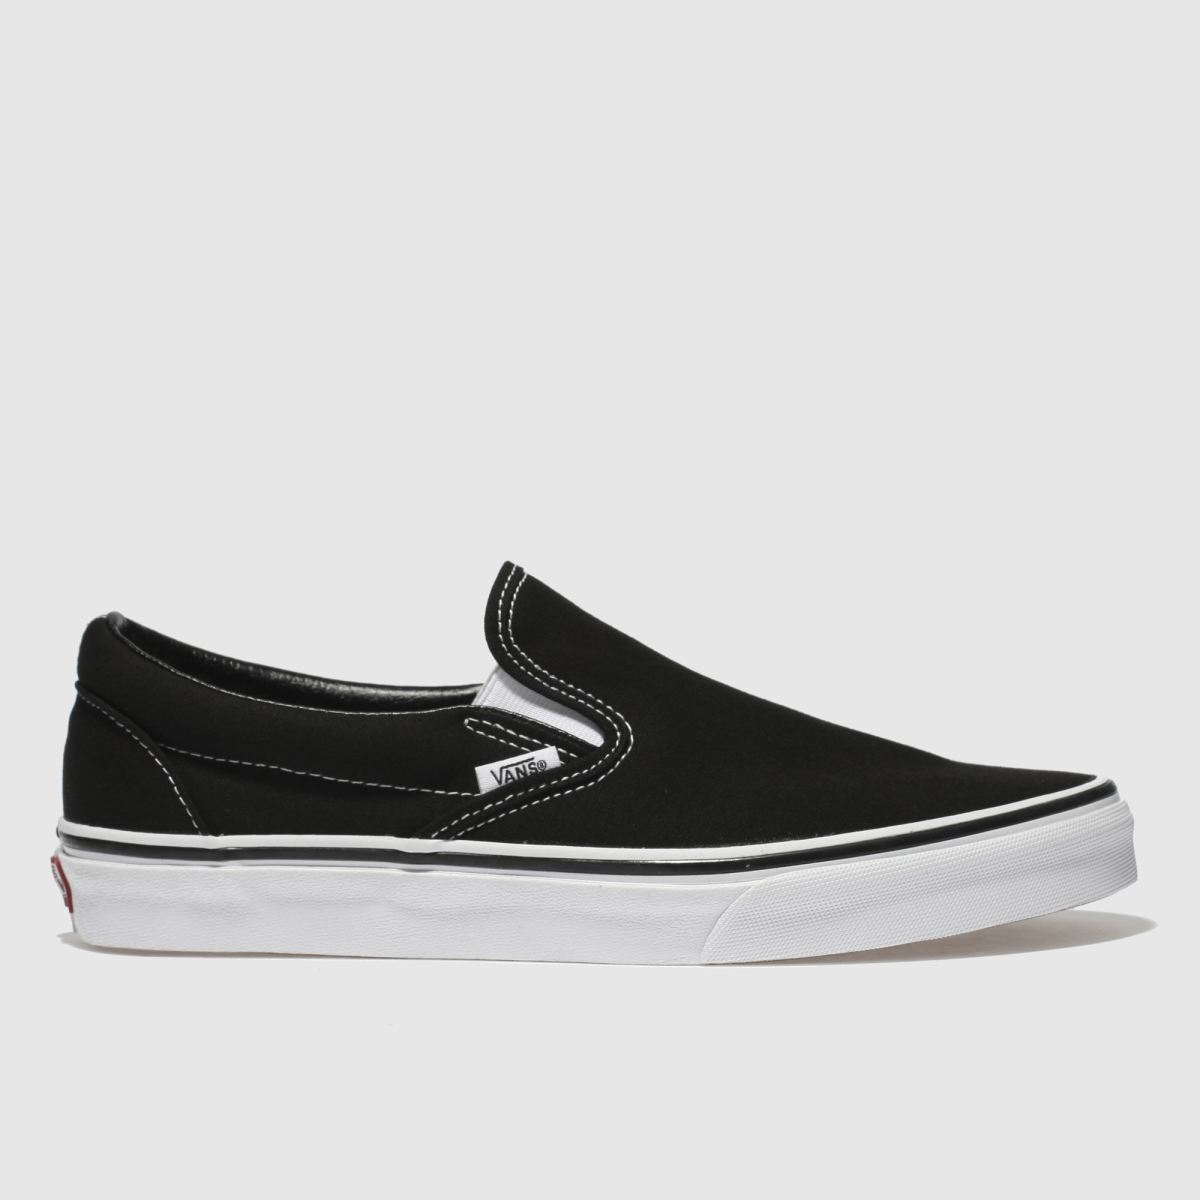 Vans Black & White Classic Slip-on Trainers